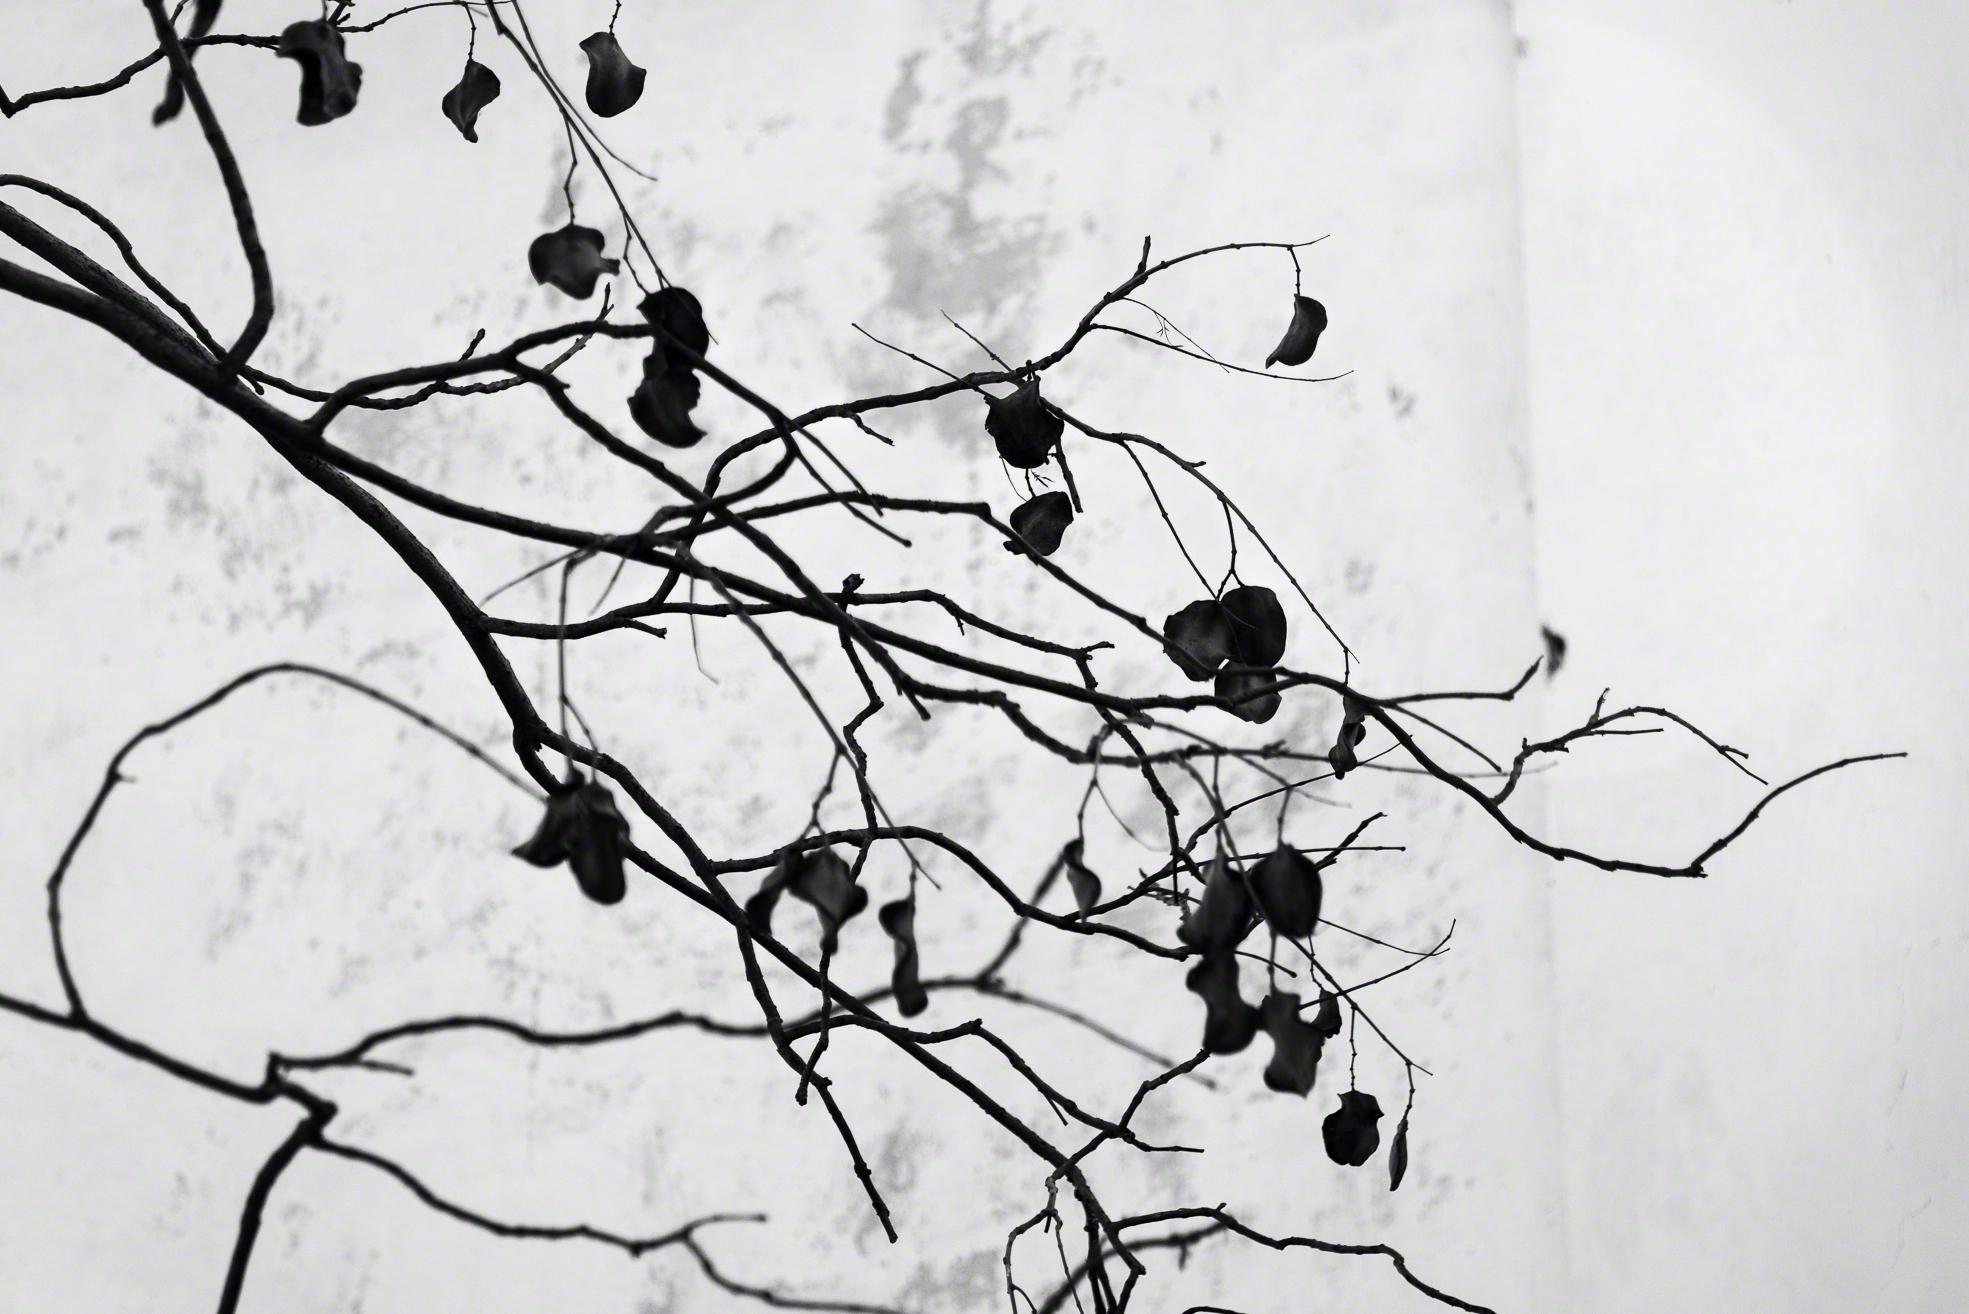 Ramas - Branches.jpg